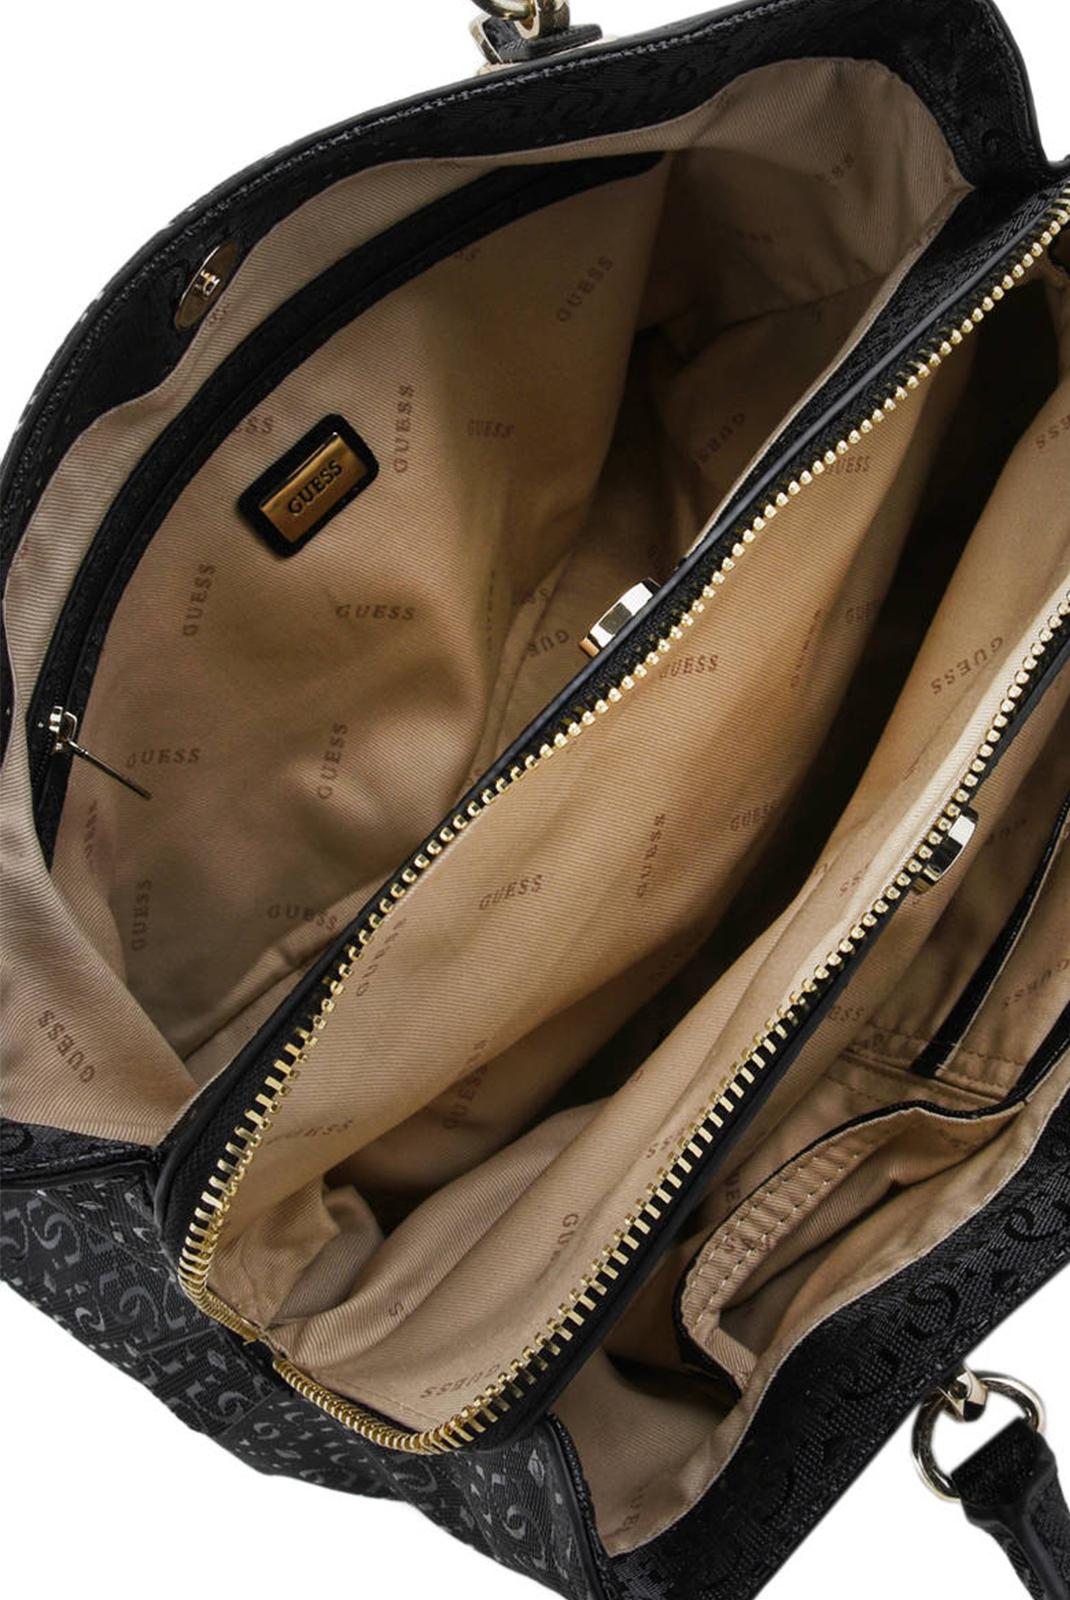 Sacs à Main  Guess jeans HWSG69 61090 BLACK